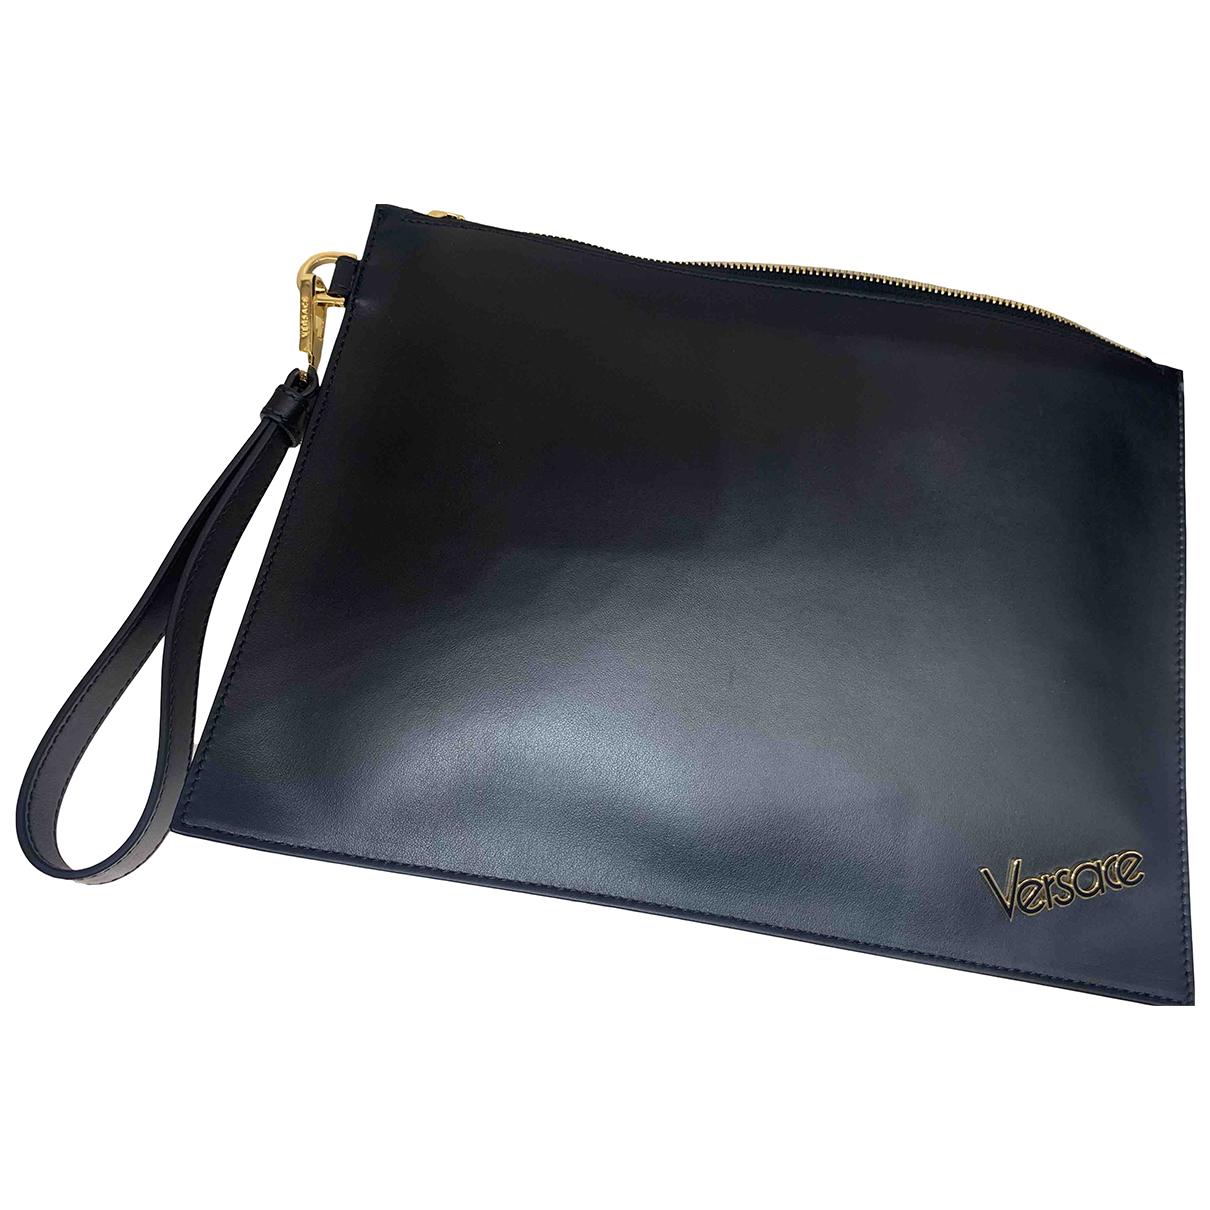 Versace \N Black Leather Clutch bag for Women \N